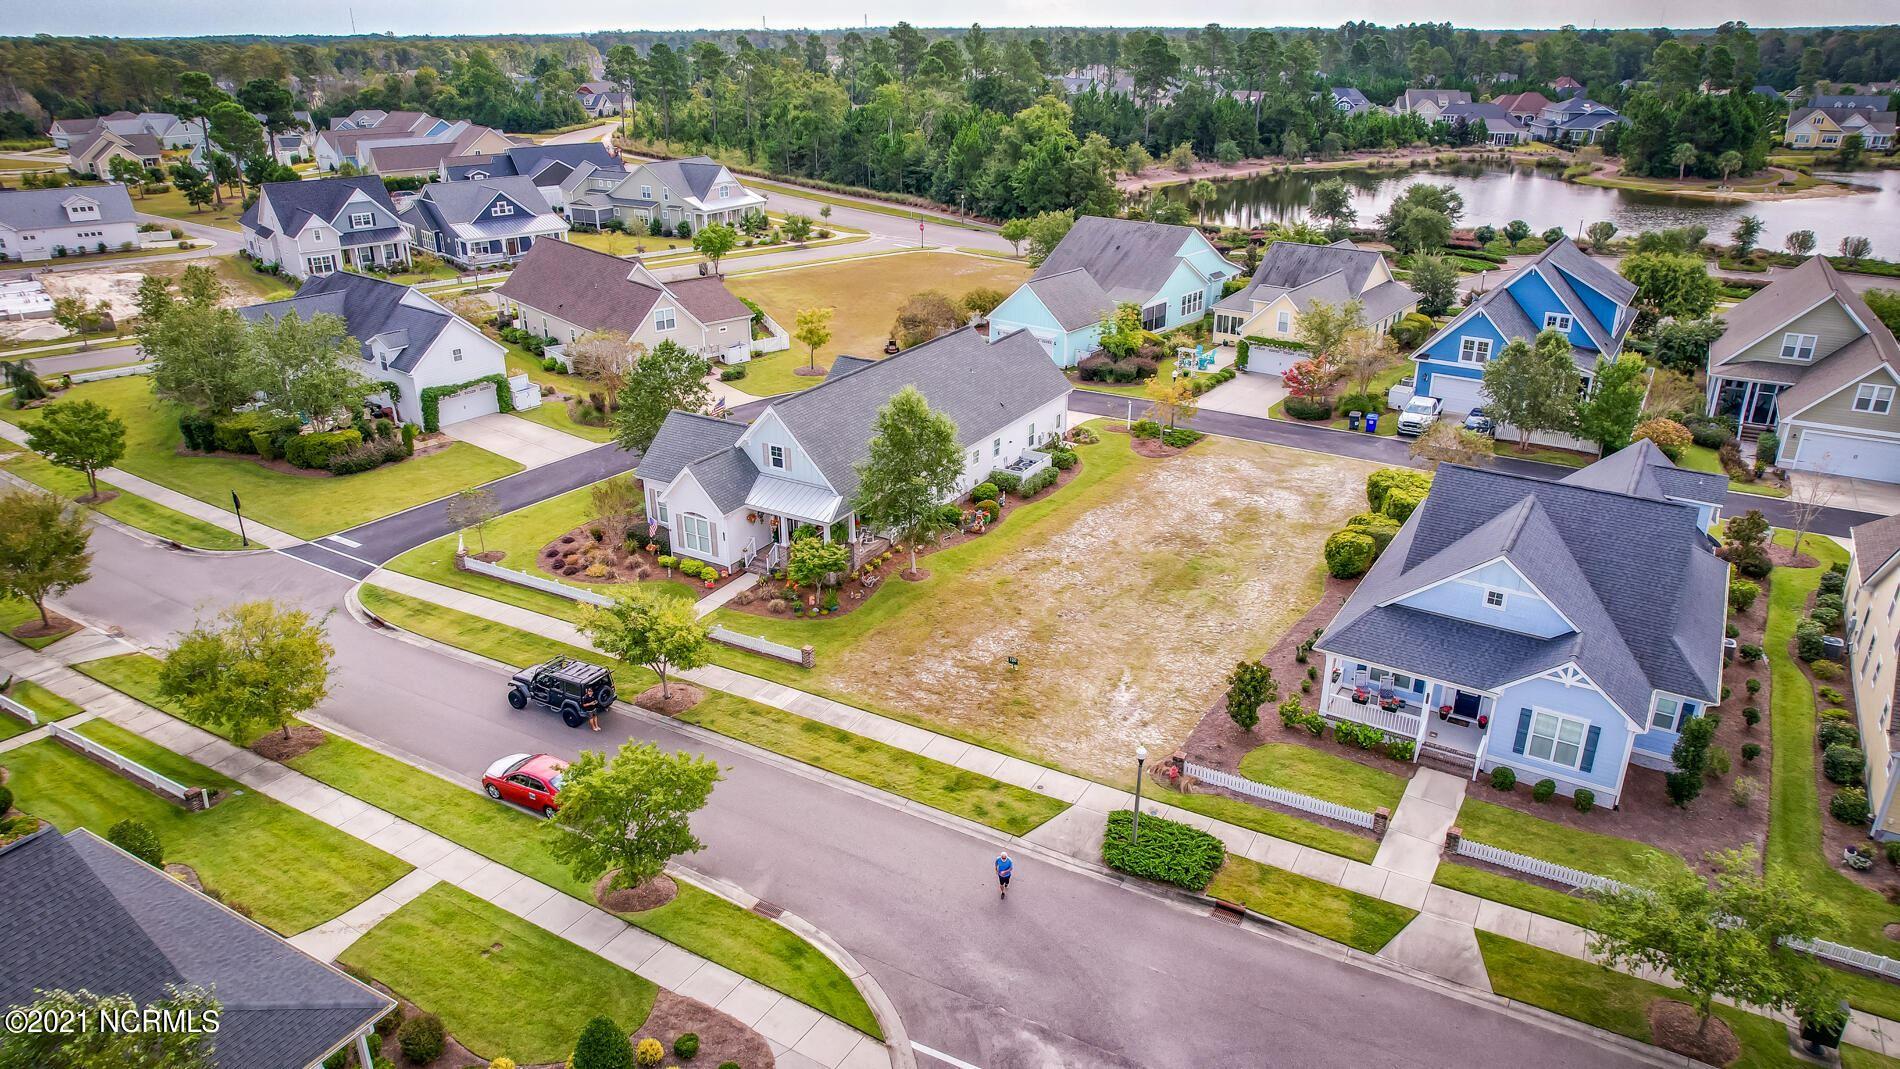 Photo of 1108 Sandy Grove Place, Leland, NC 28451 (MLS # 100291511)